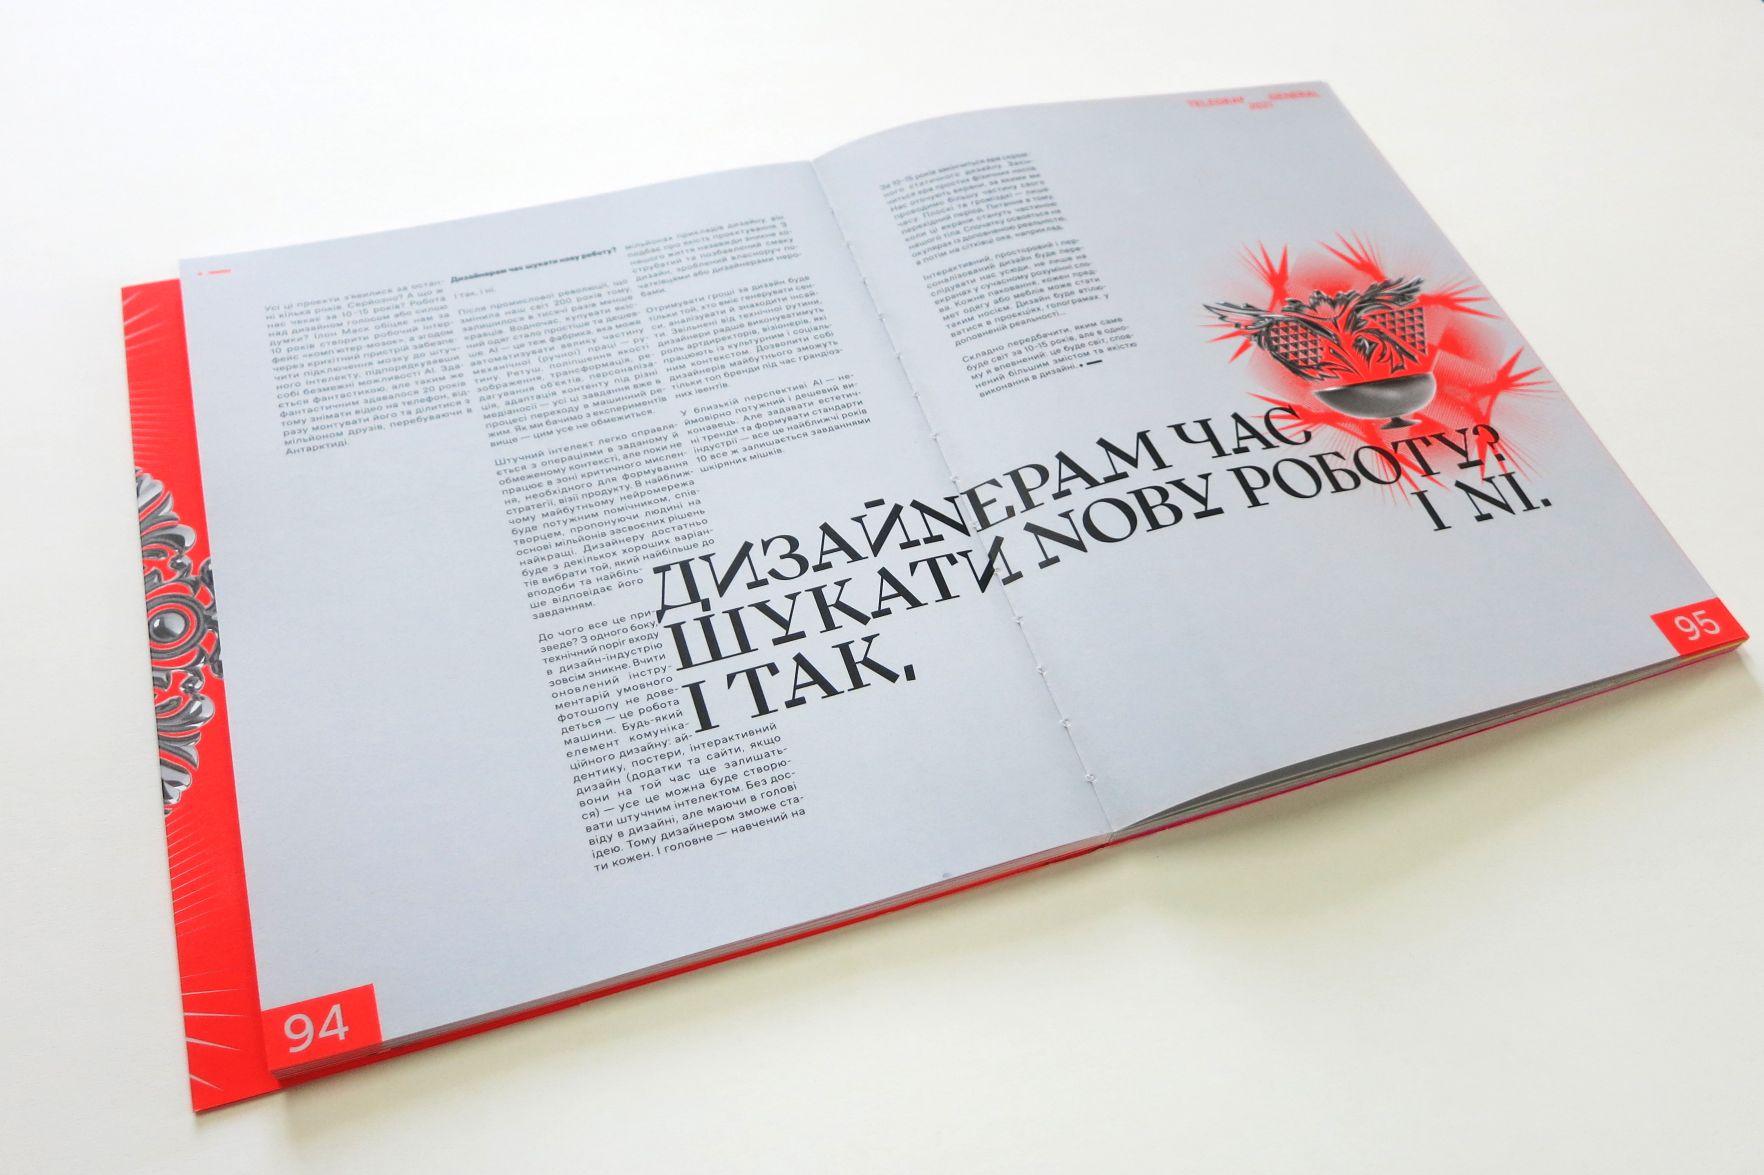 Наше портфоліо: Журнал Telegraf.Design